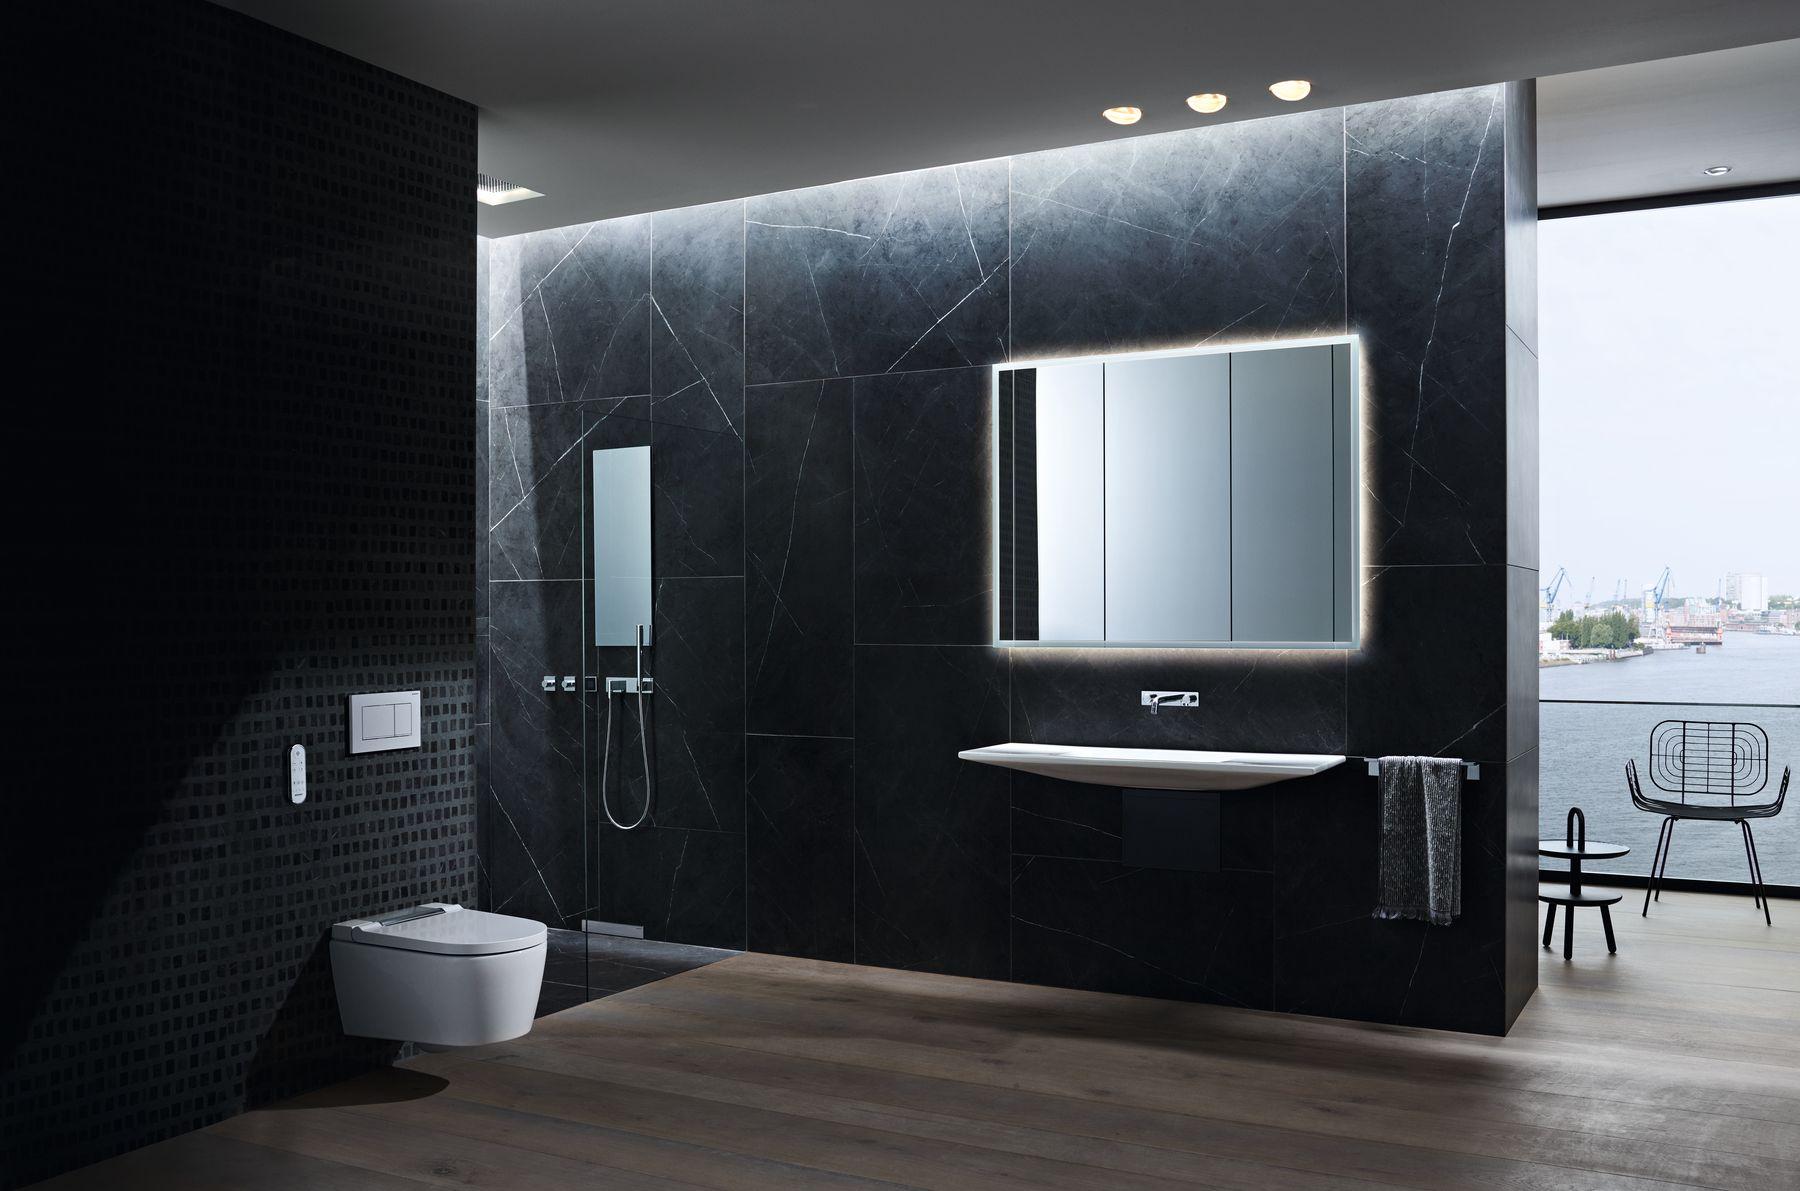 2019 Bathroom 01 B Geberit ONE AquaClean Sela floating_bigview